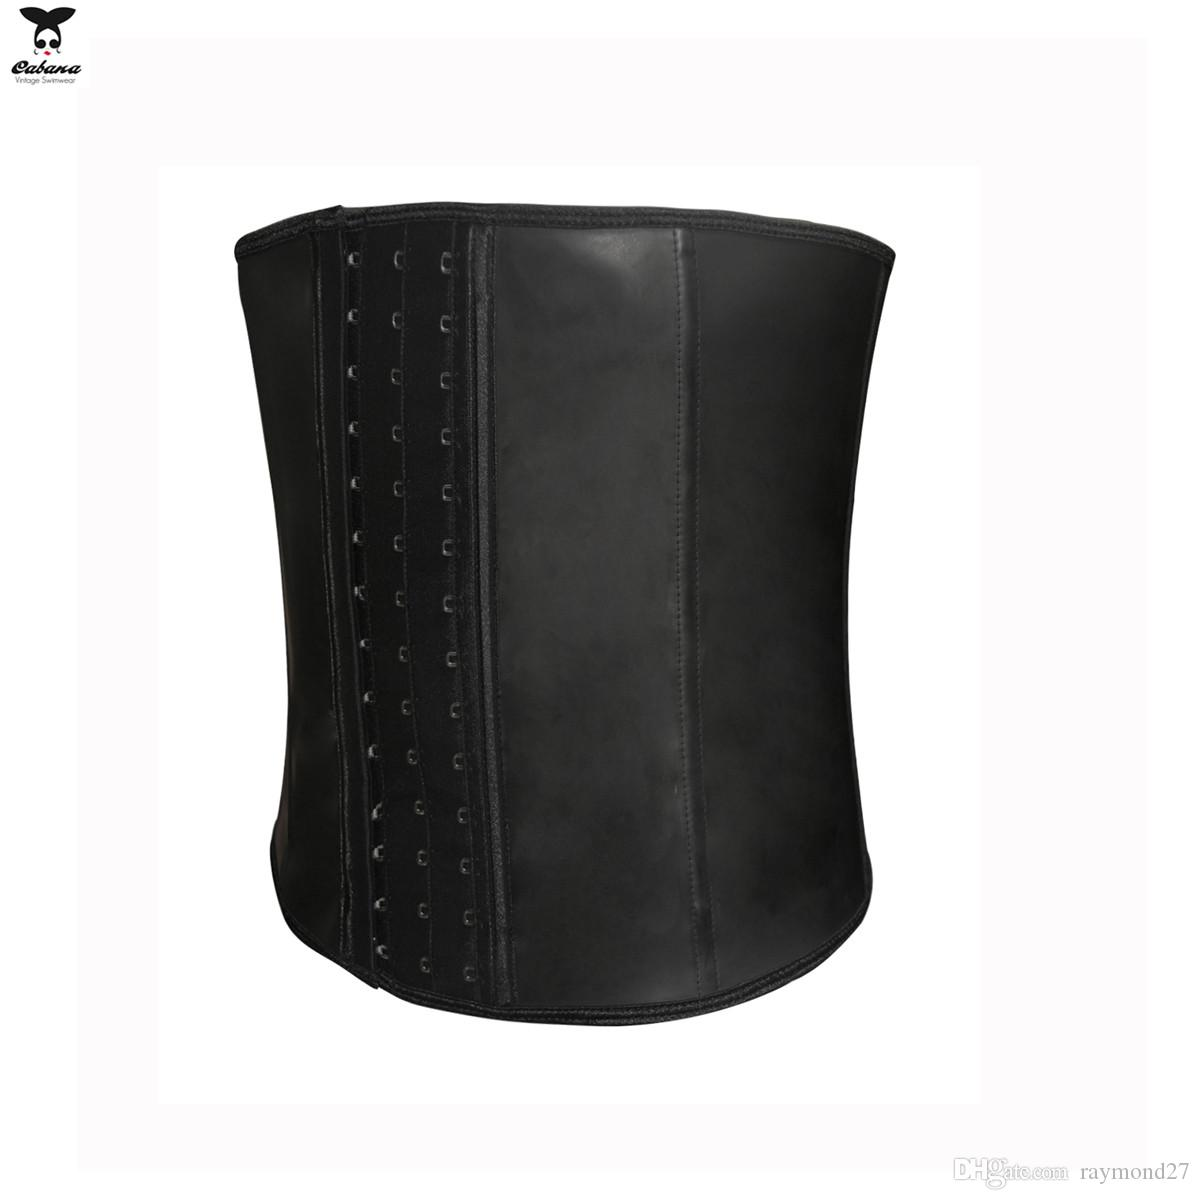 Latex Waist Trainer for Men Hot Shapers Waist Cincher Firm Tummy Slimming Latex Waist Cincher Corset Plus Size Waist Training Corsets